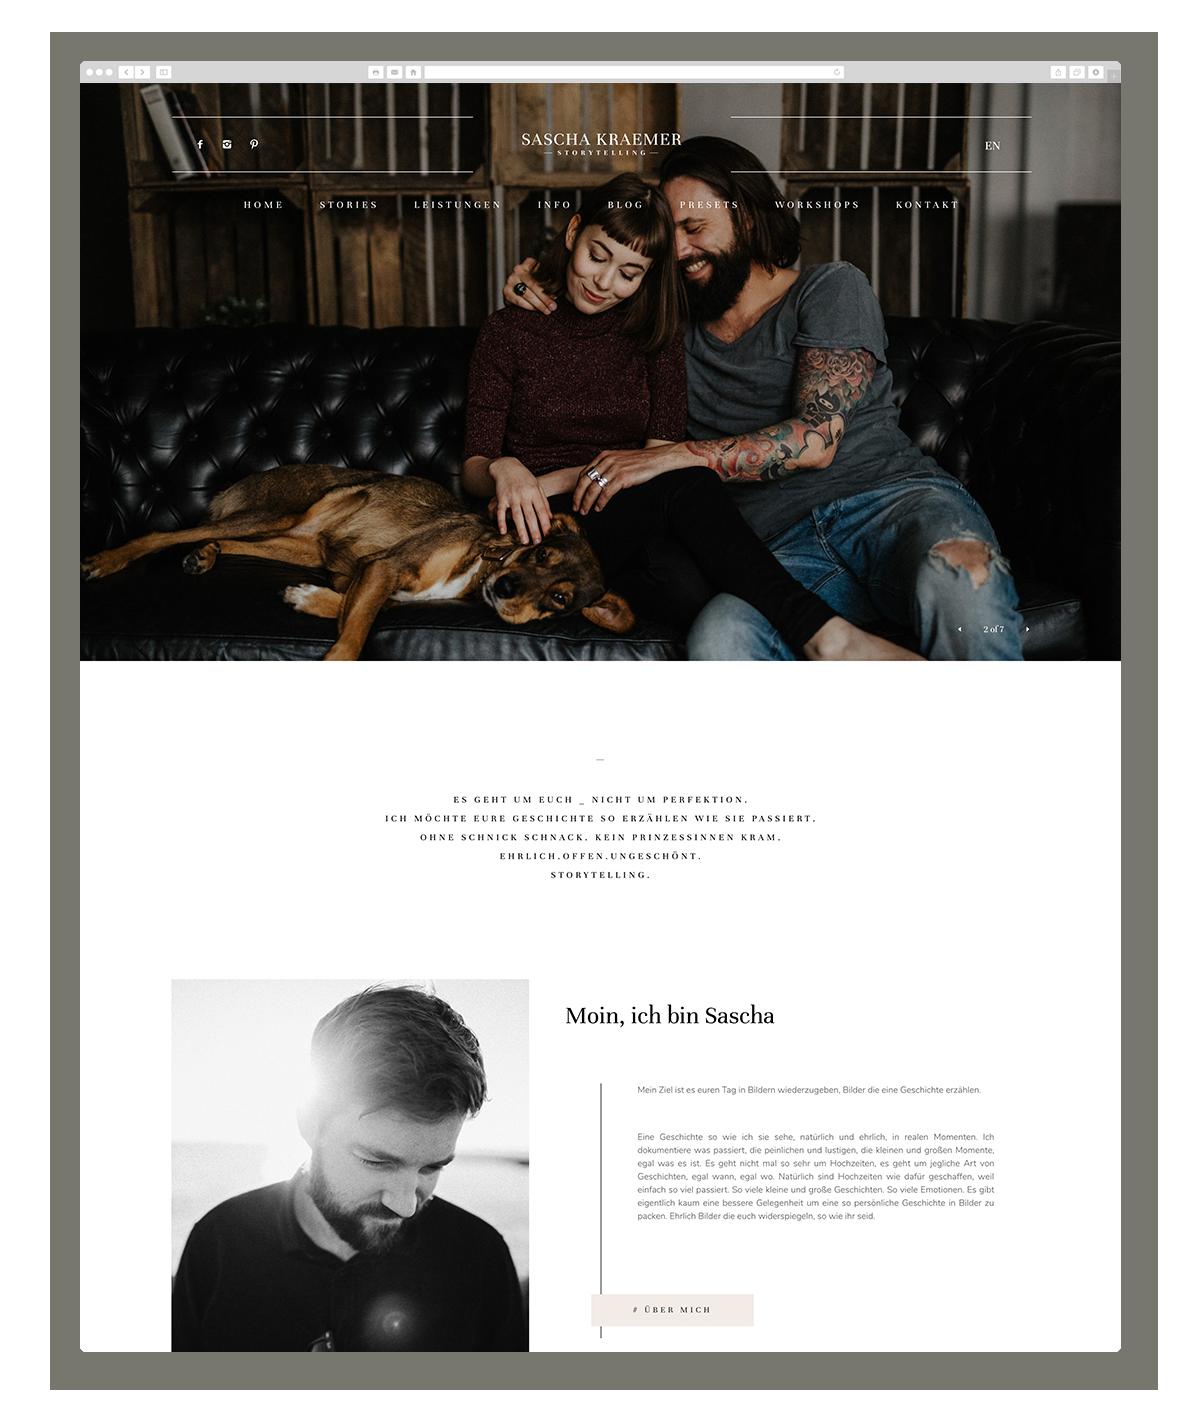 Sascha Kraemer German Photographers using Flothemes for their website